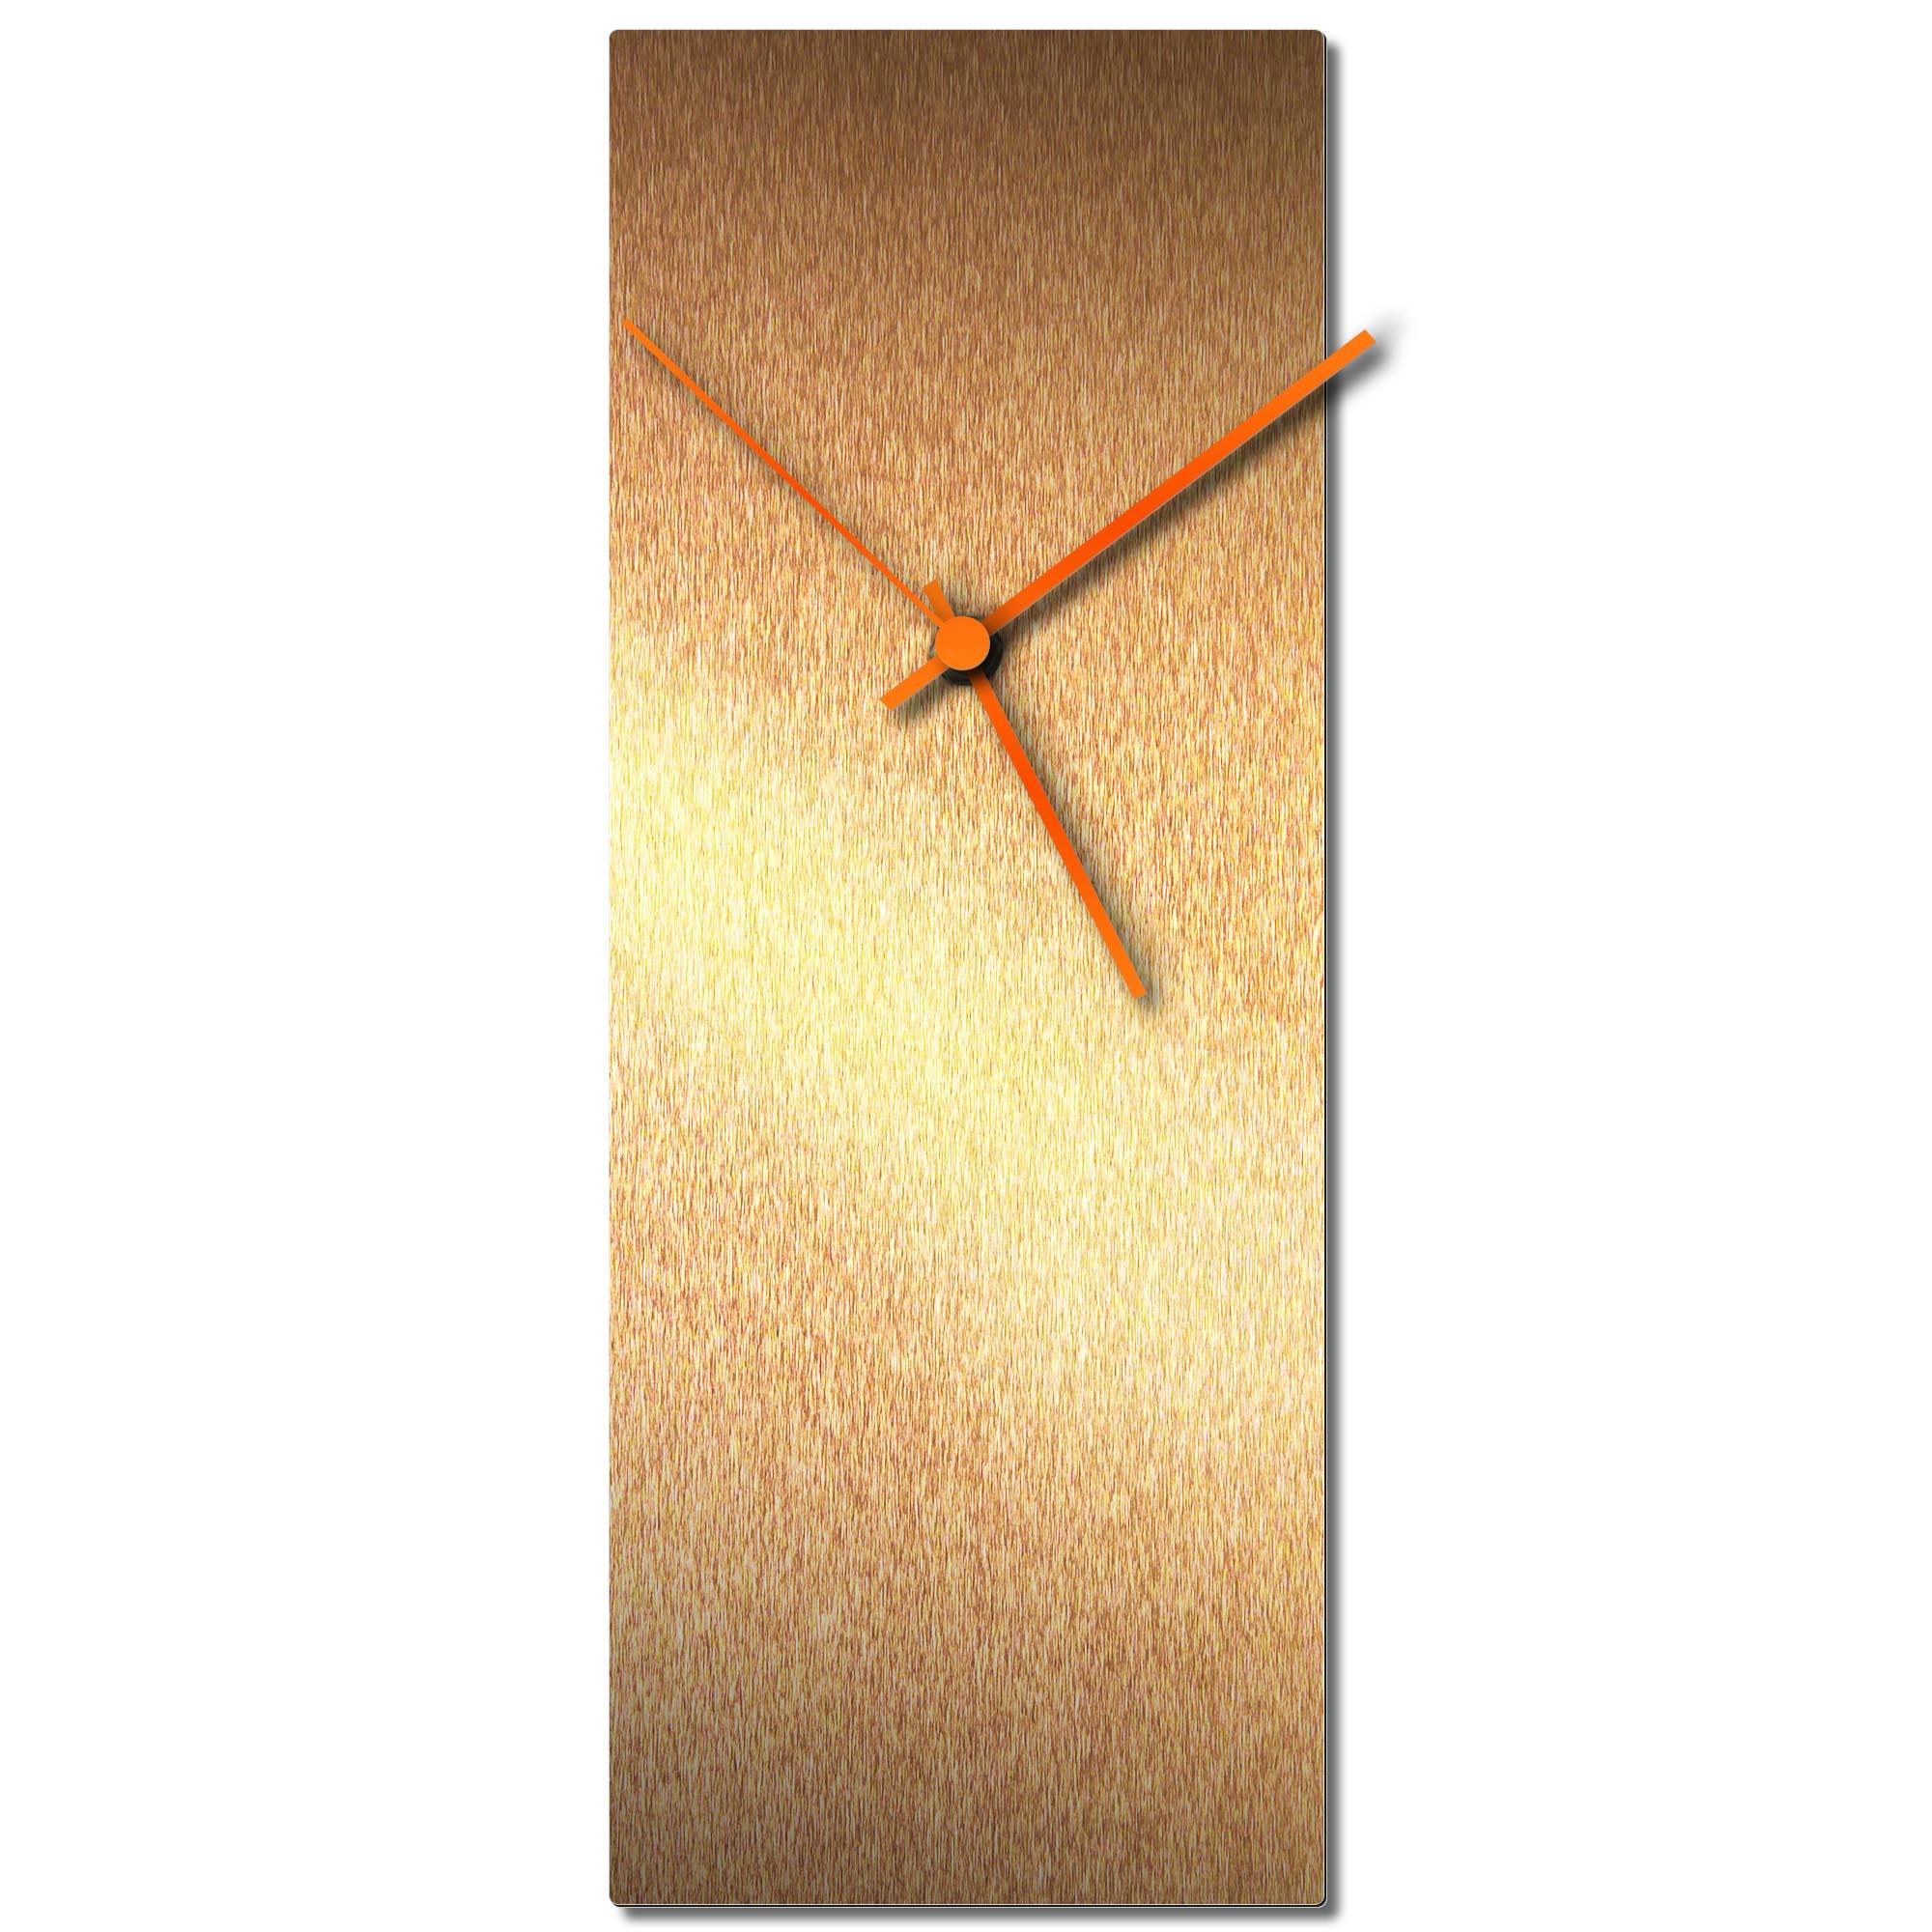 Adam Schwoeppe 'Bronzesmith Clock Large Orange' Midcentury Modern Style Wall Clock